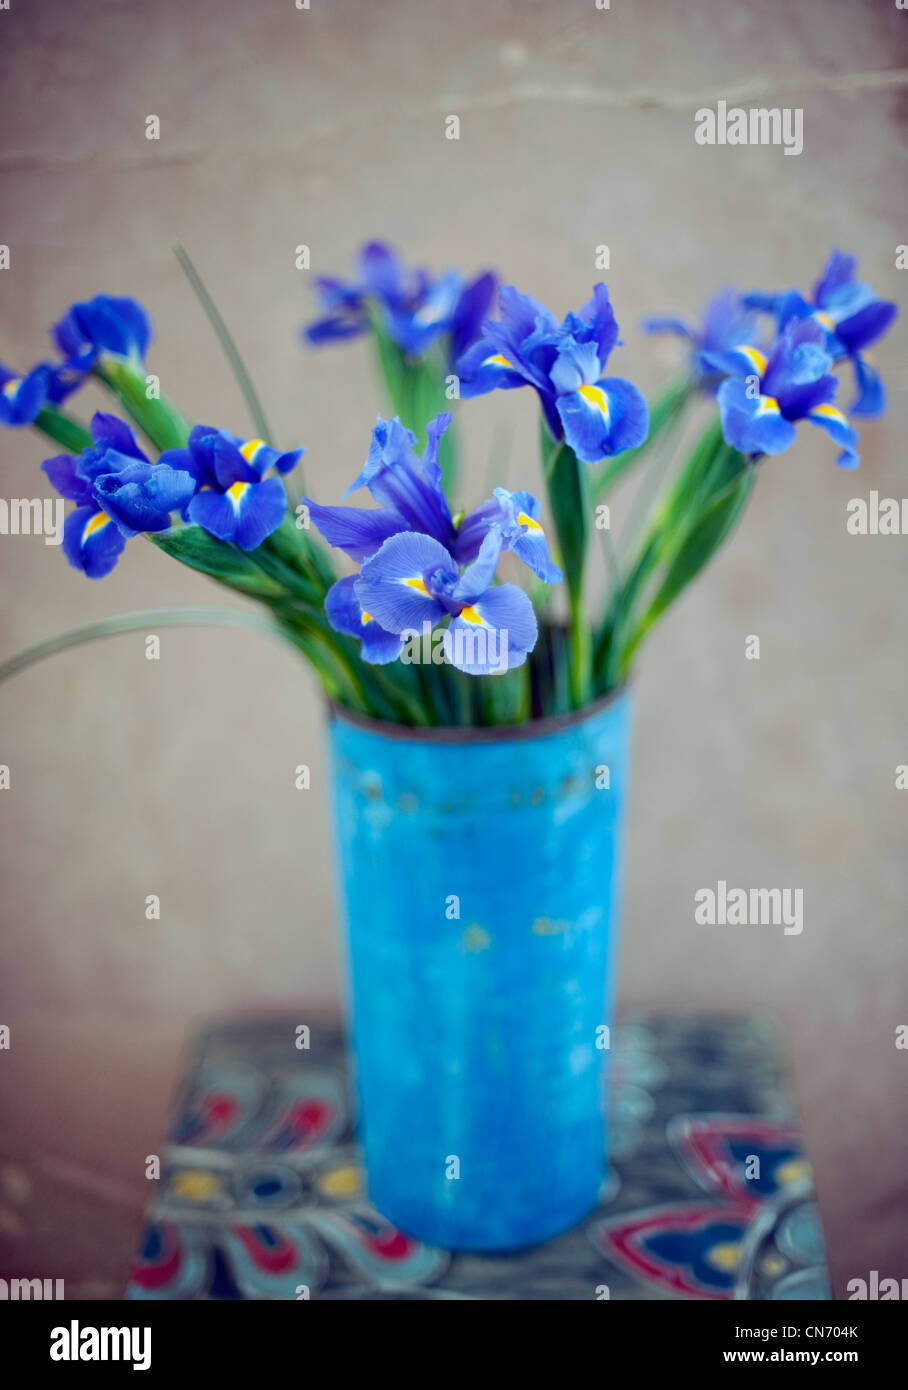 Iris flowers in a vase. - Stock Image